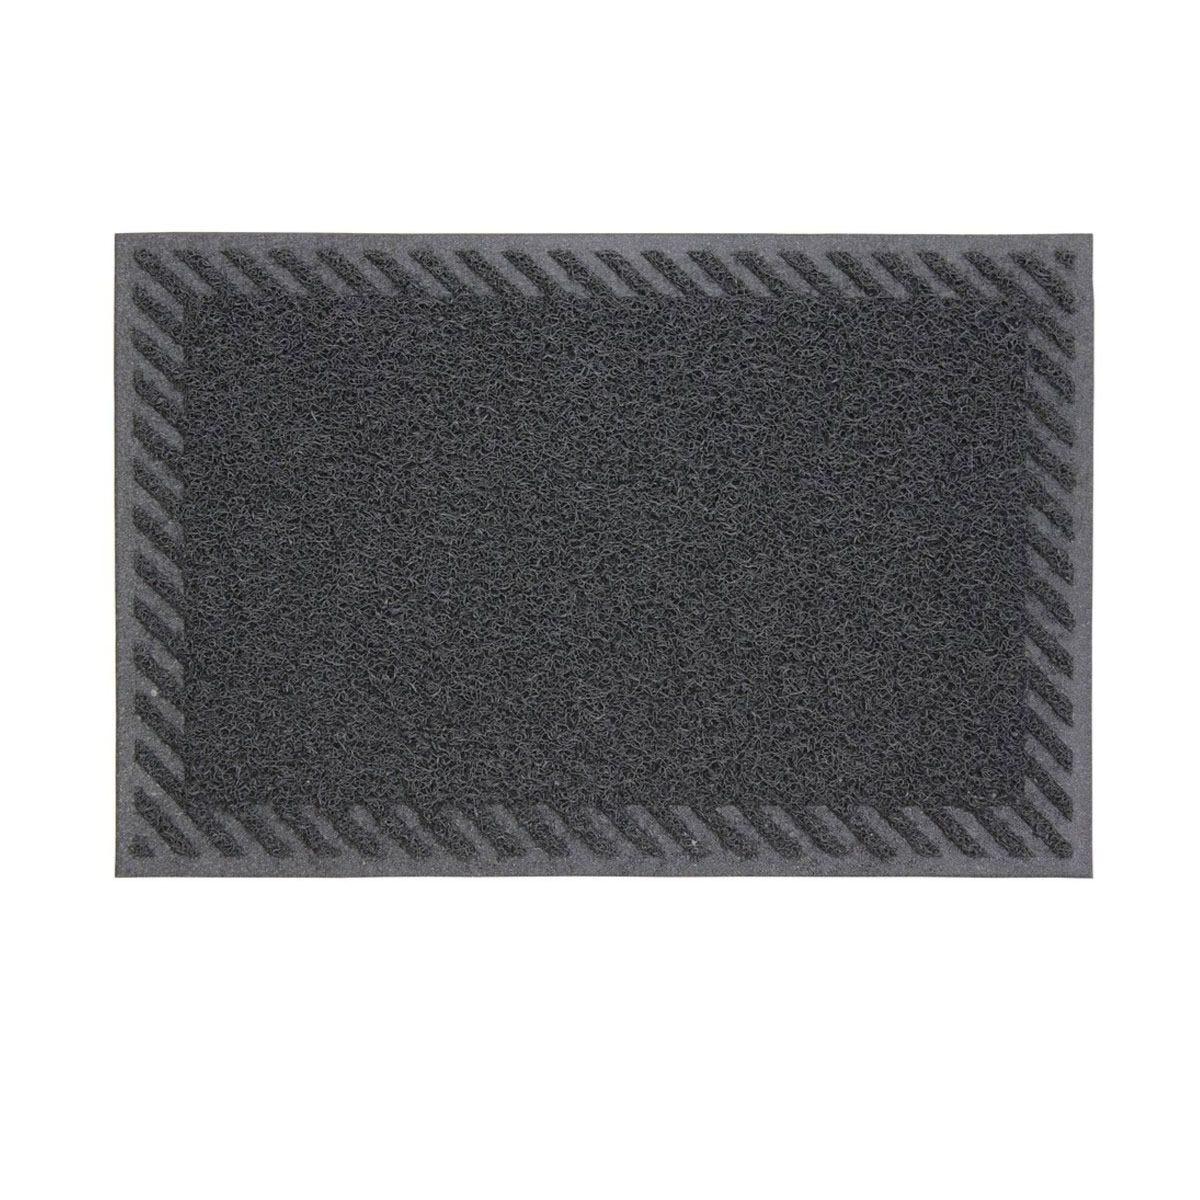 JVL Mud Grabber PVC Spaghetti 40 x 60cm Striped Door Mat - Grey